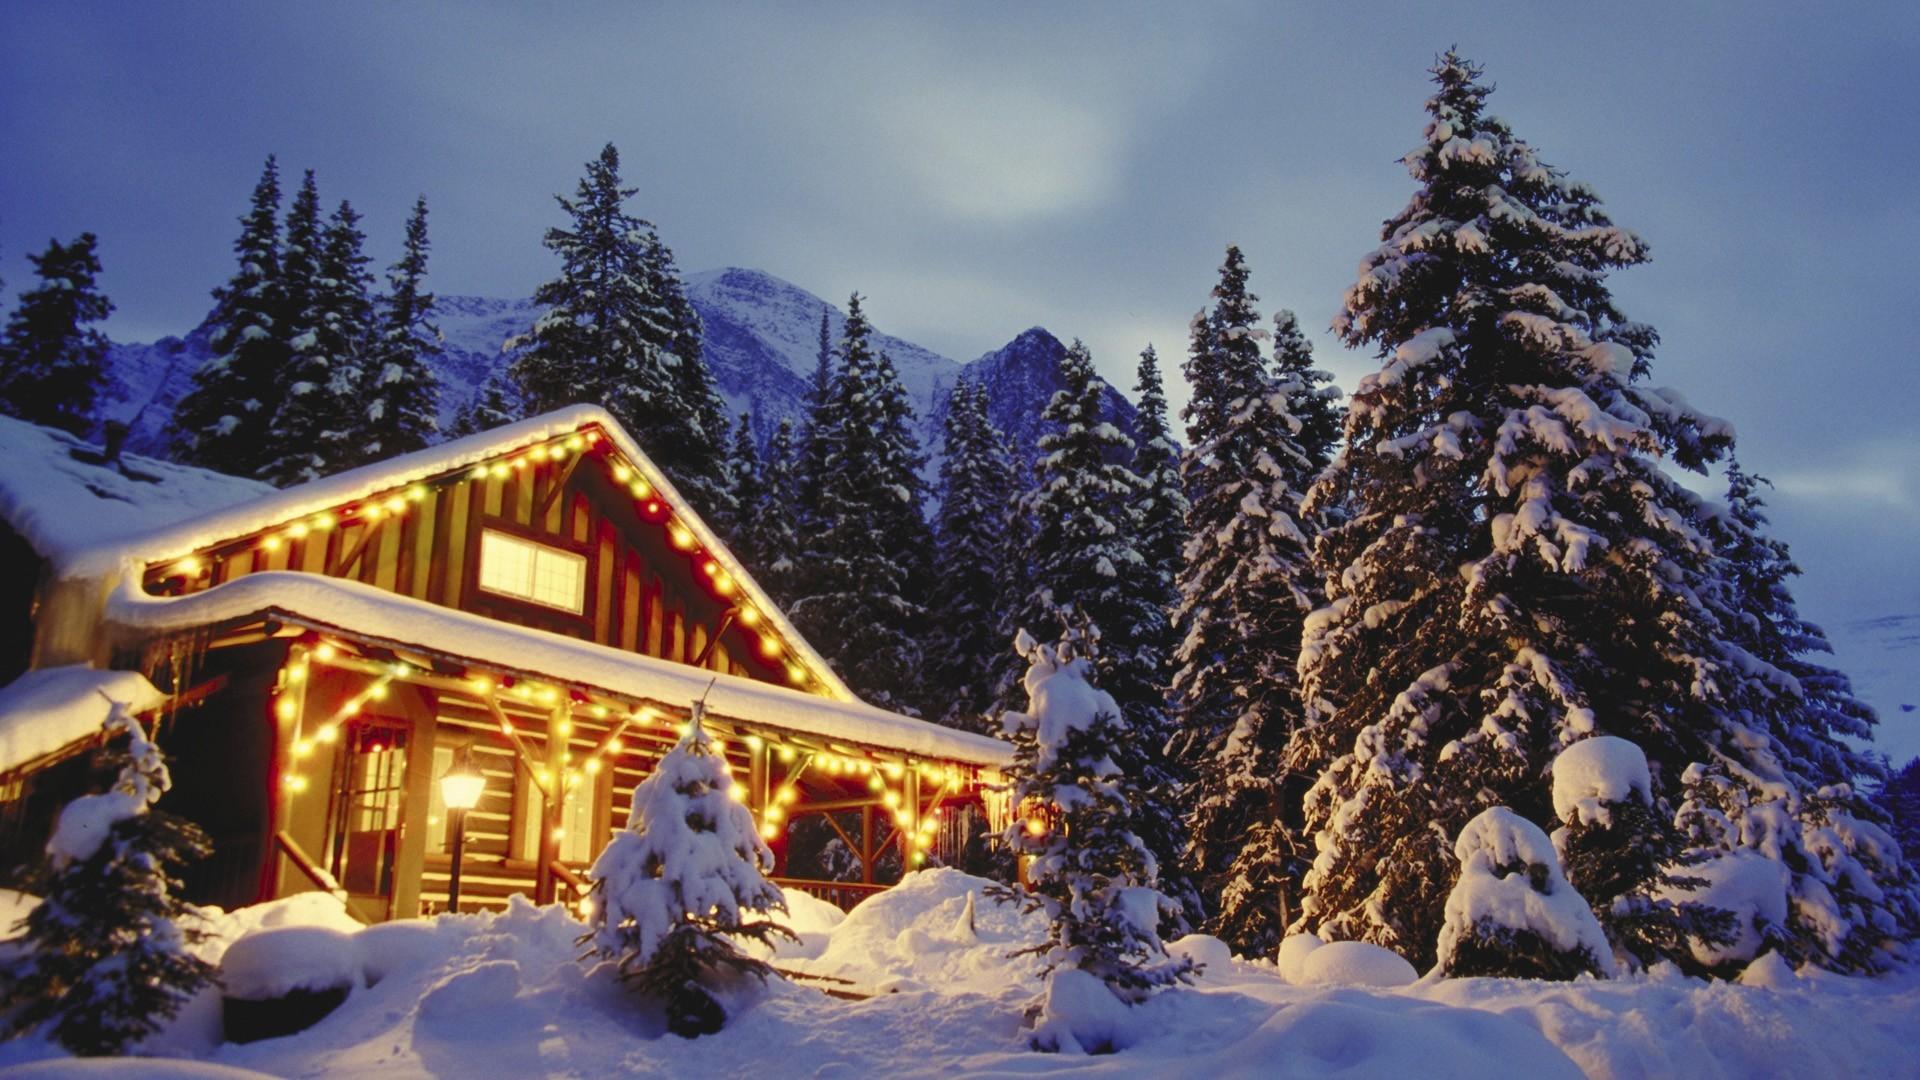 christmas wallpaper mountains snowy scene 1920×1080